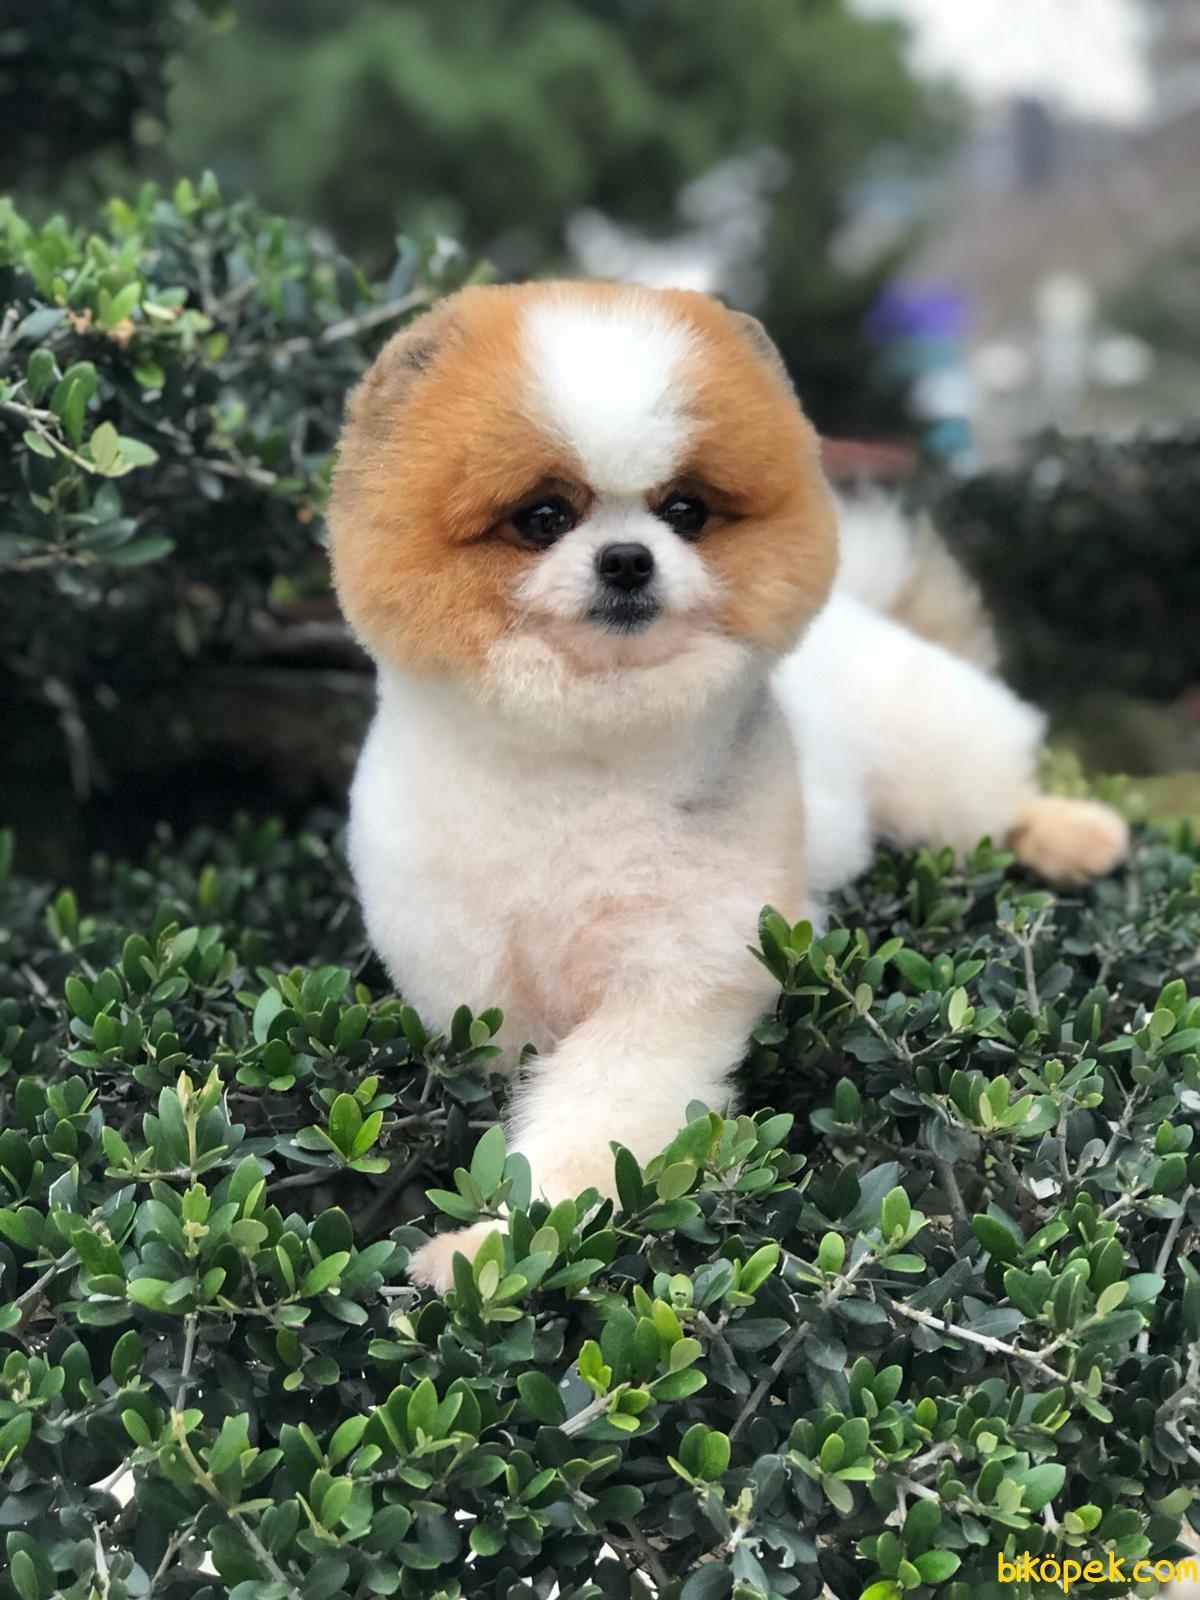 Scr Belgeli Orjinal Pomeranian Boo 2